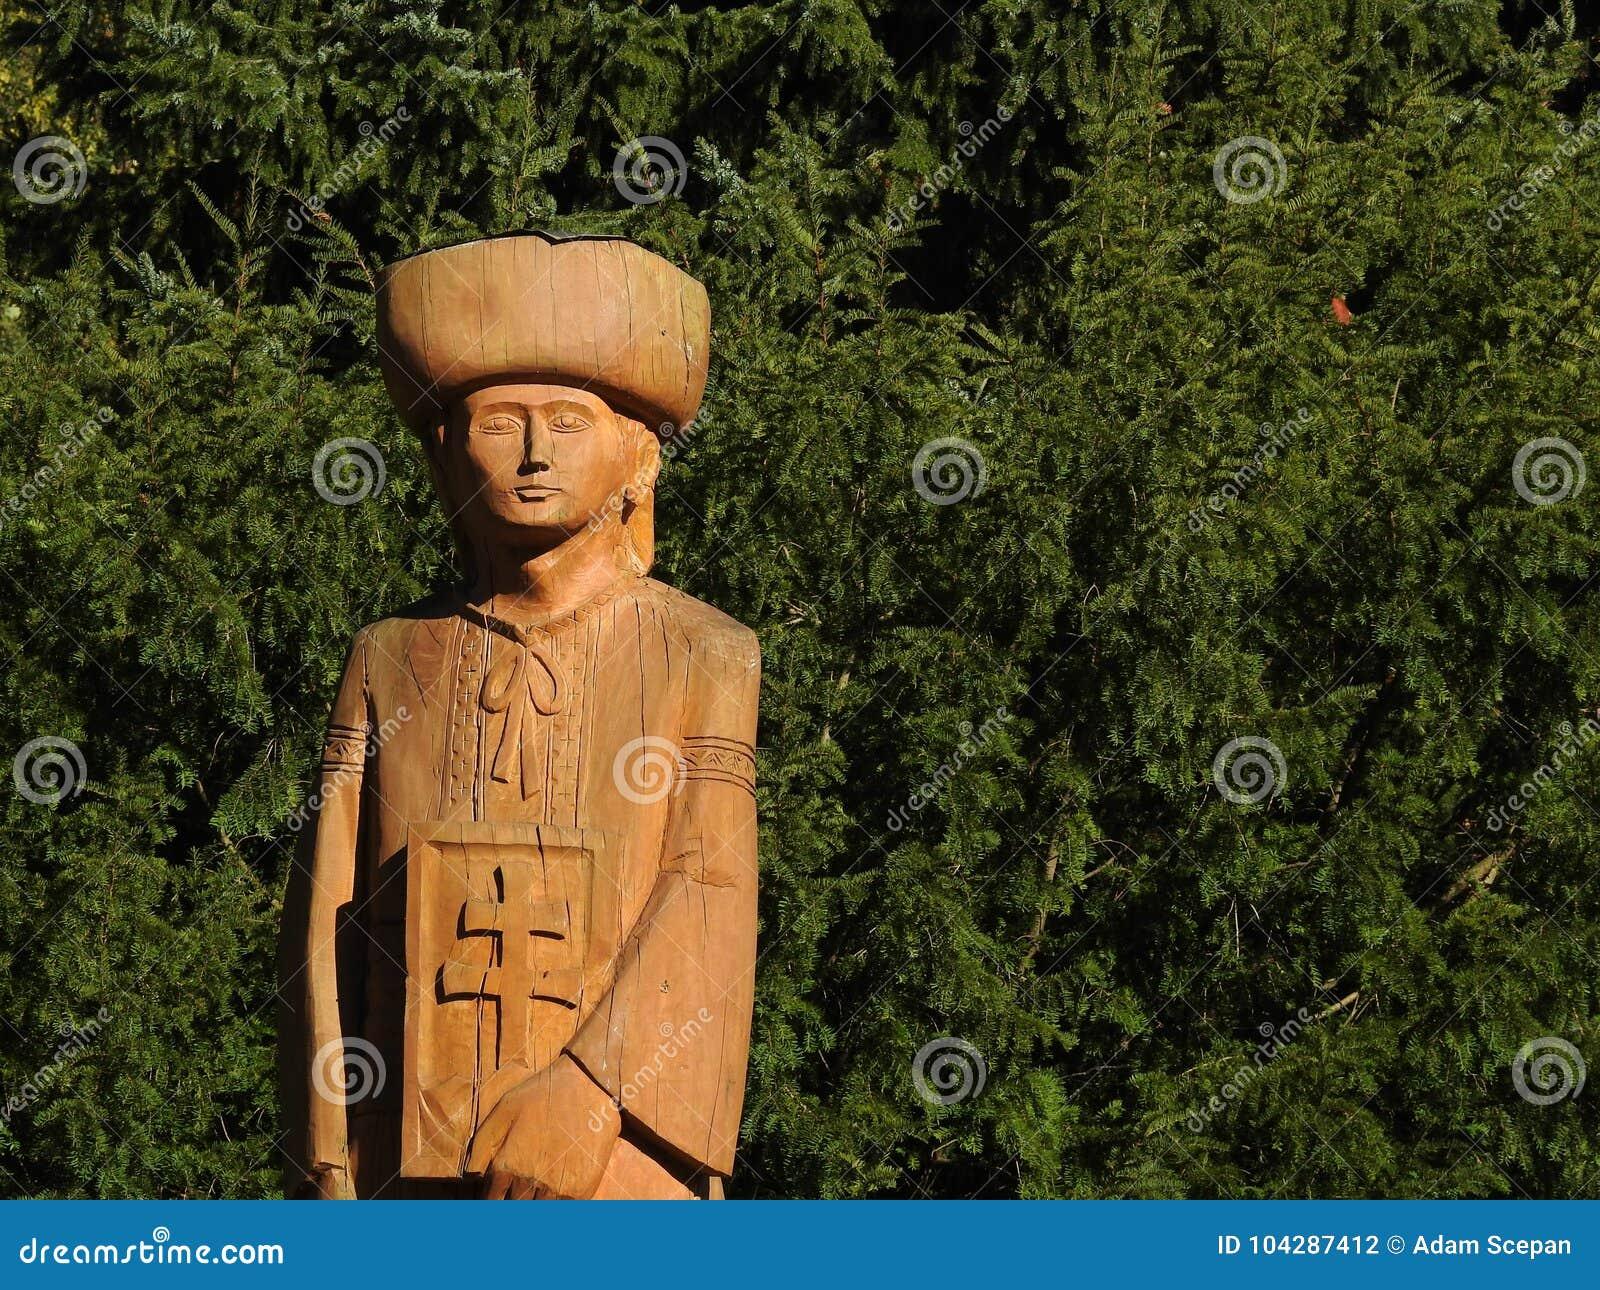 Wooden Figure - Slovak Legend Juraj Janosik